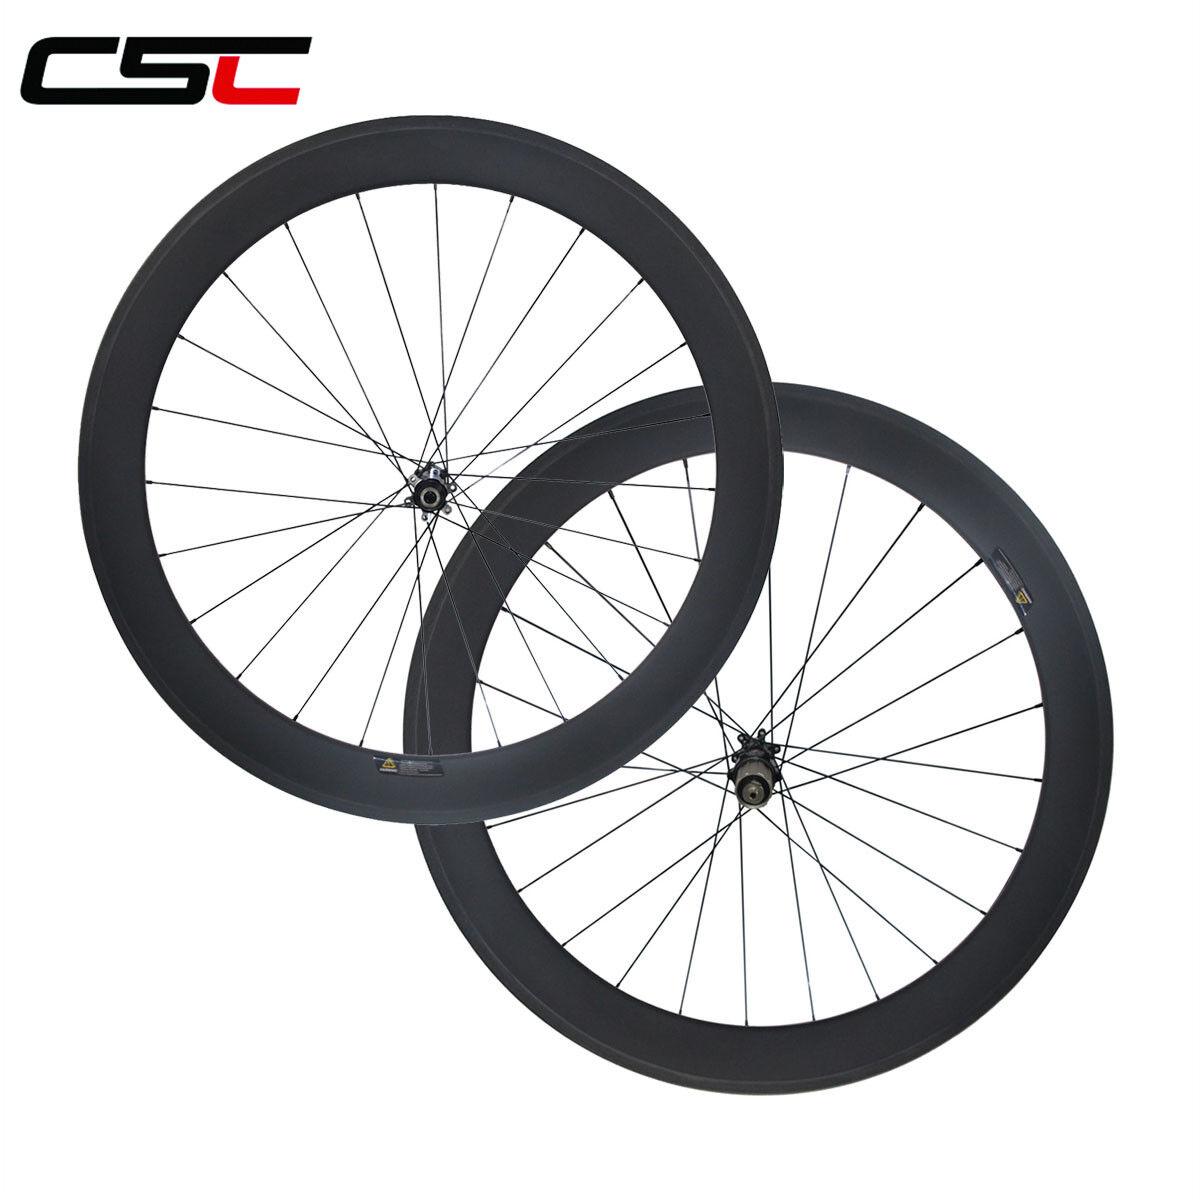 Straight pull carbon 60mm clincher cyclocross wheels Novatec disc  thru axle hub  online cheap